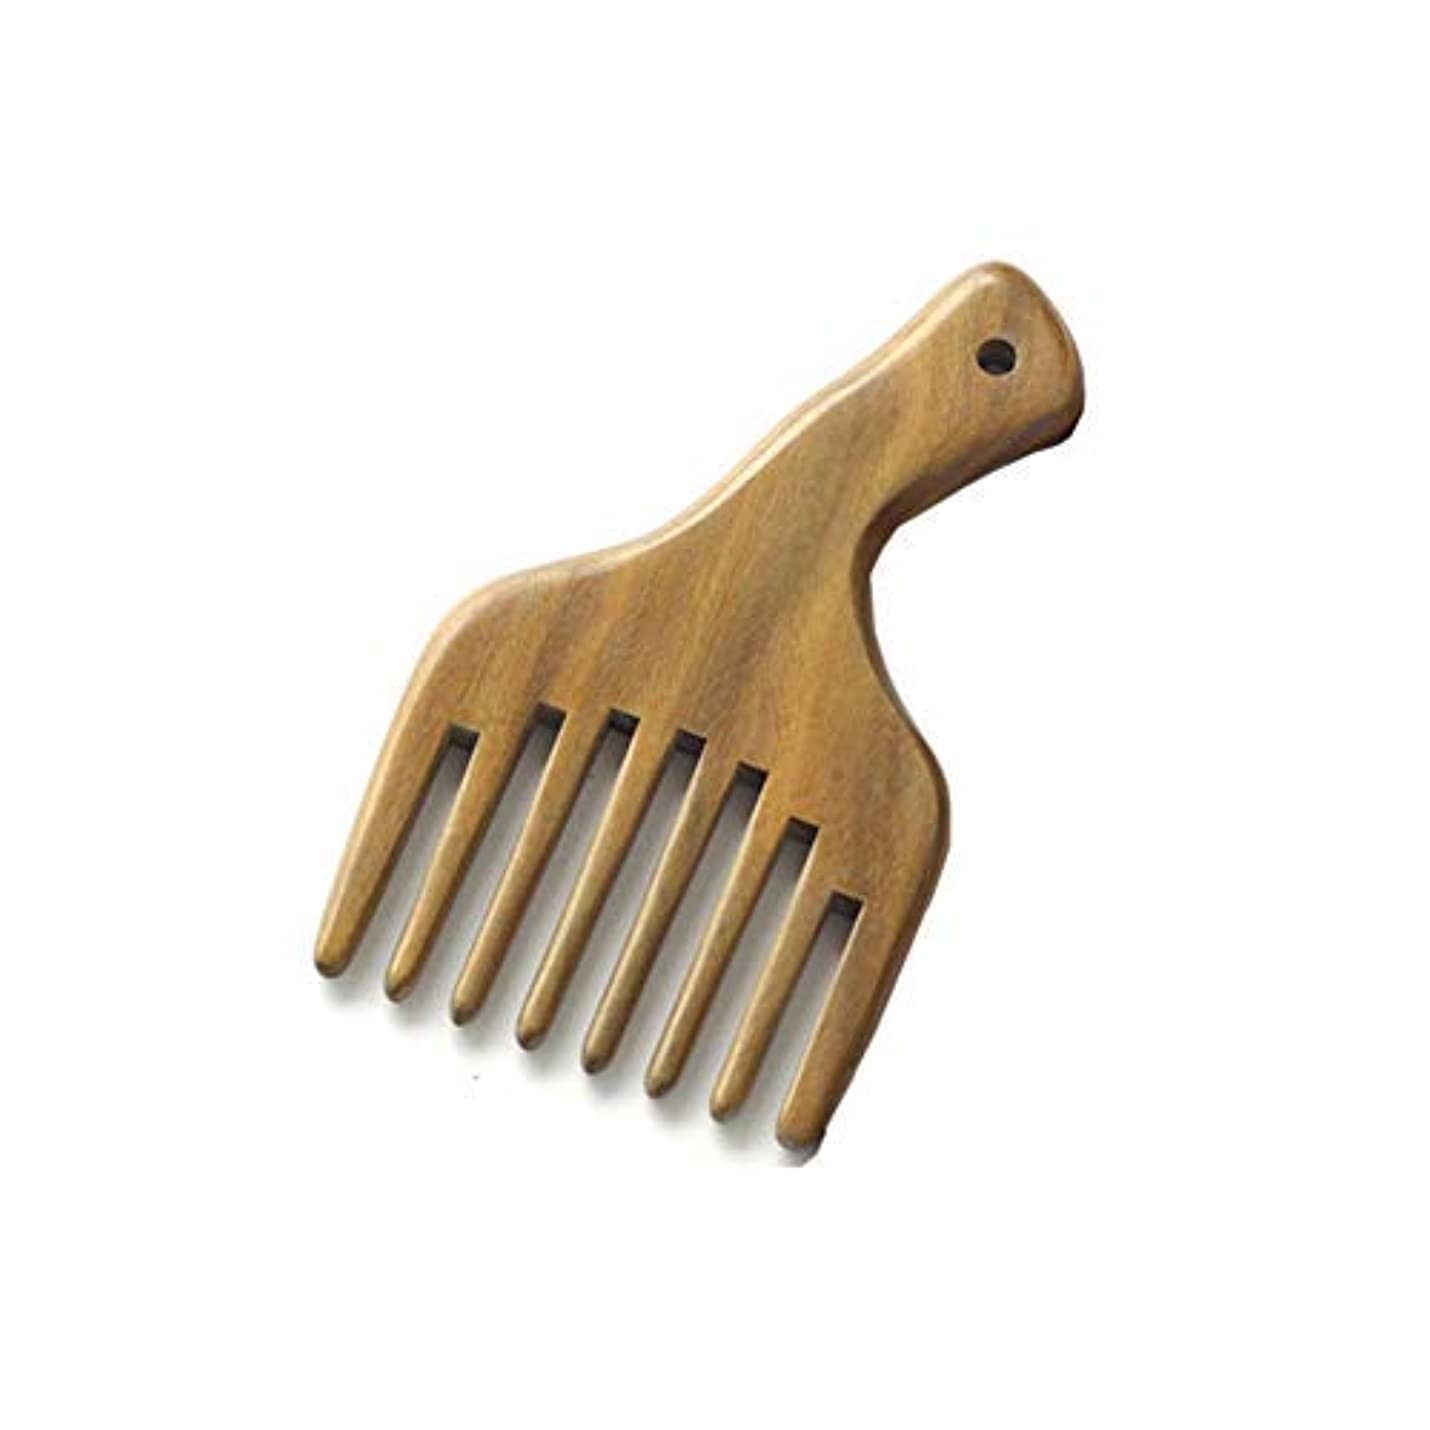 1 Pack Sandalwood Hair Pick Wide Tooth Hair Comb Hair Beard Pick Comb Wooden Hair Comb Afro Pick Lift Comb [並行輸入品]